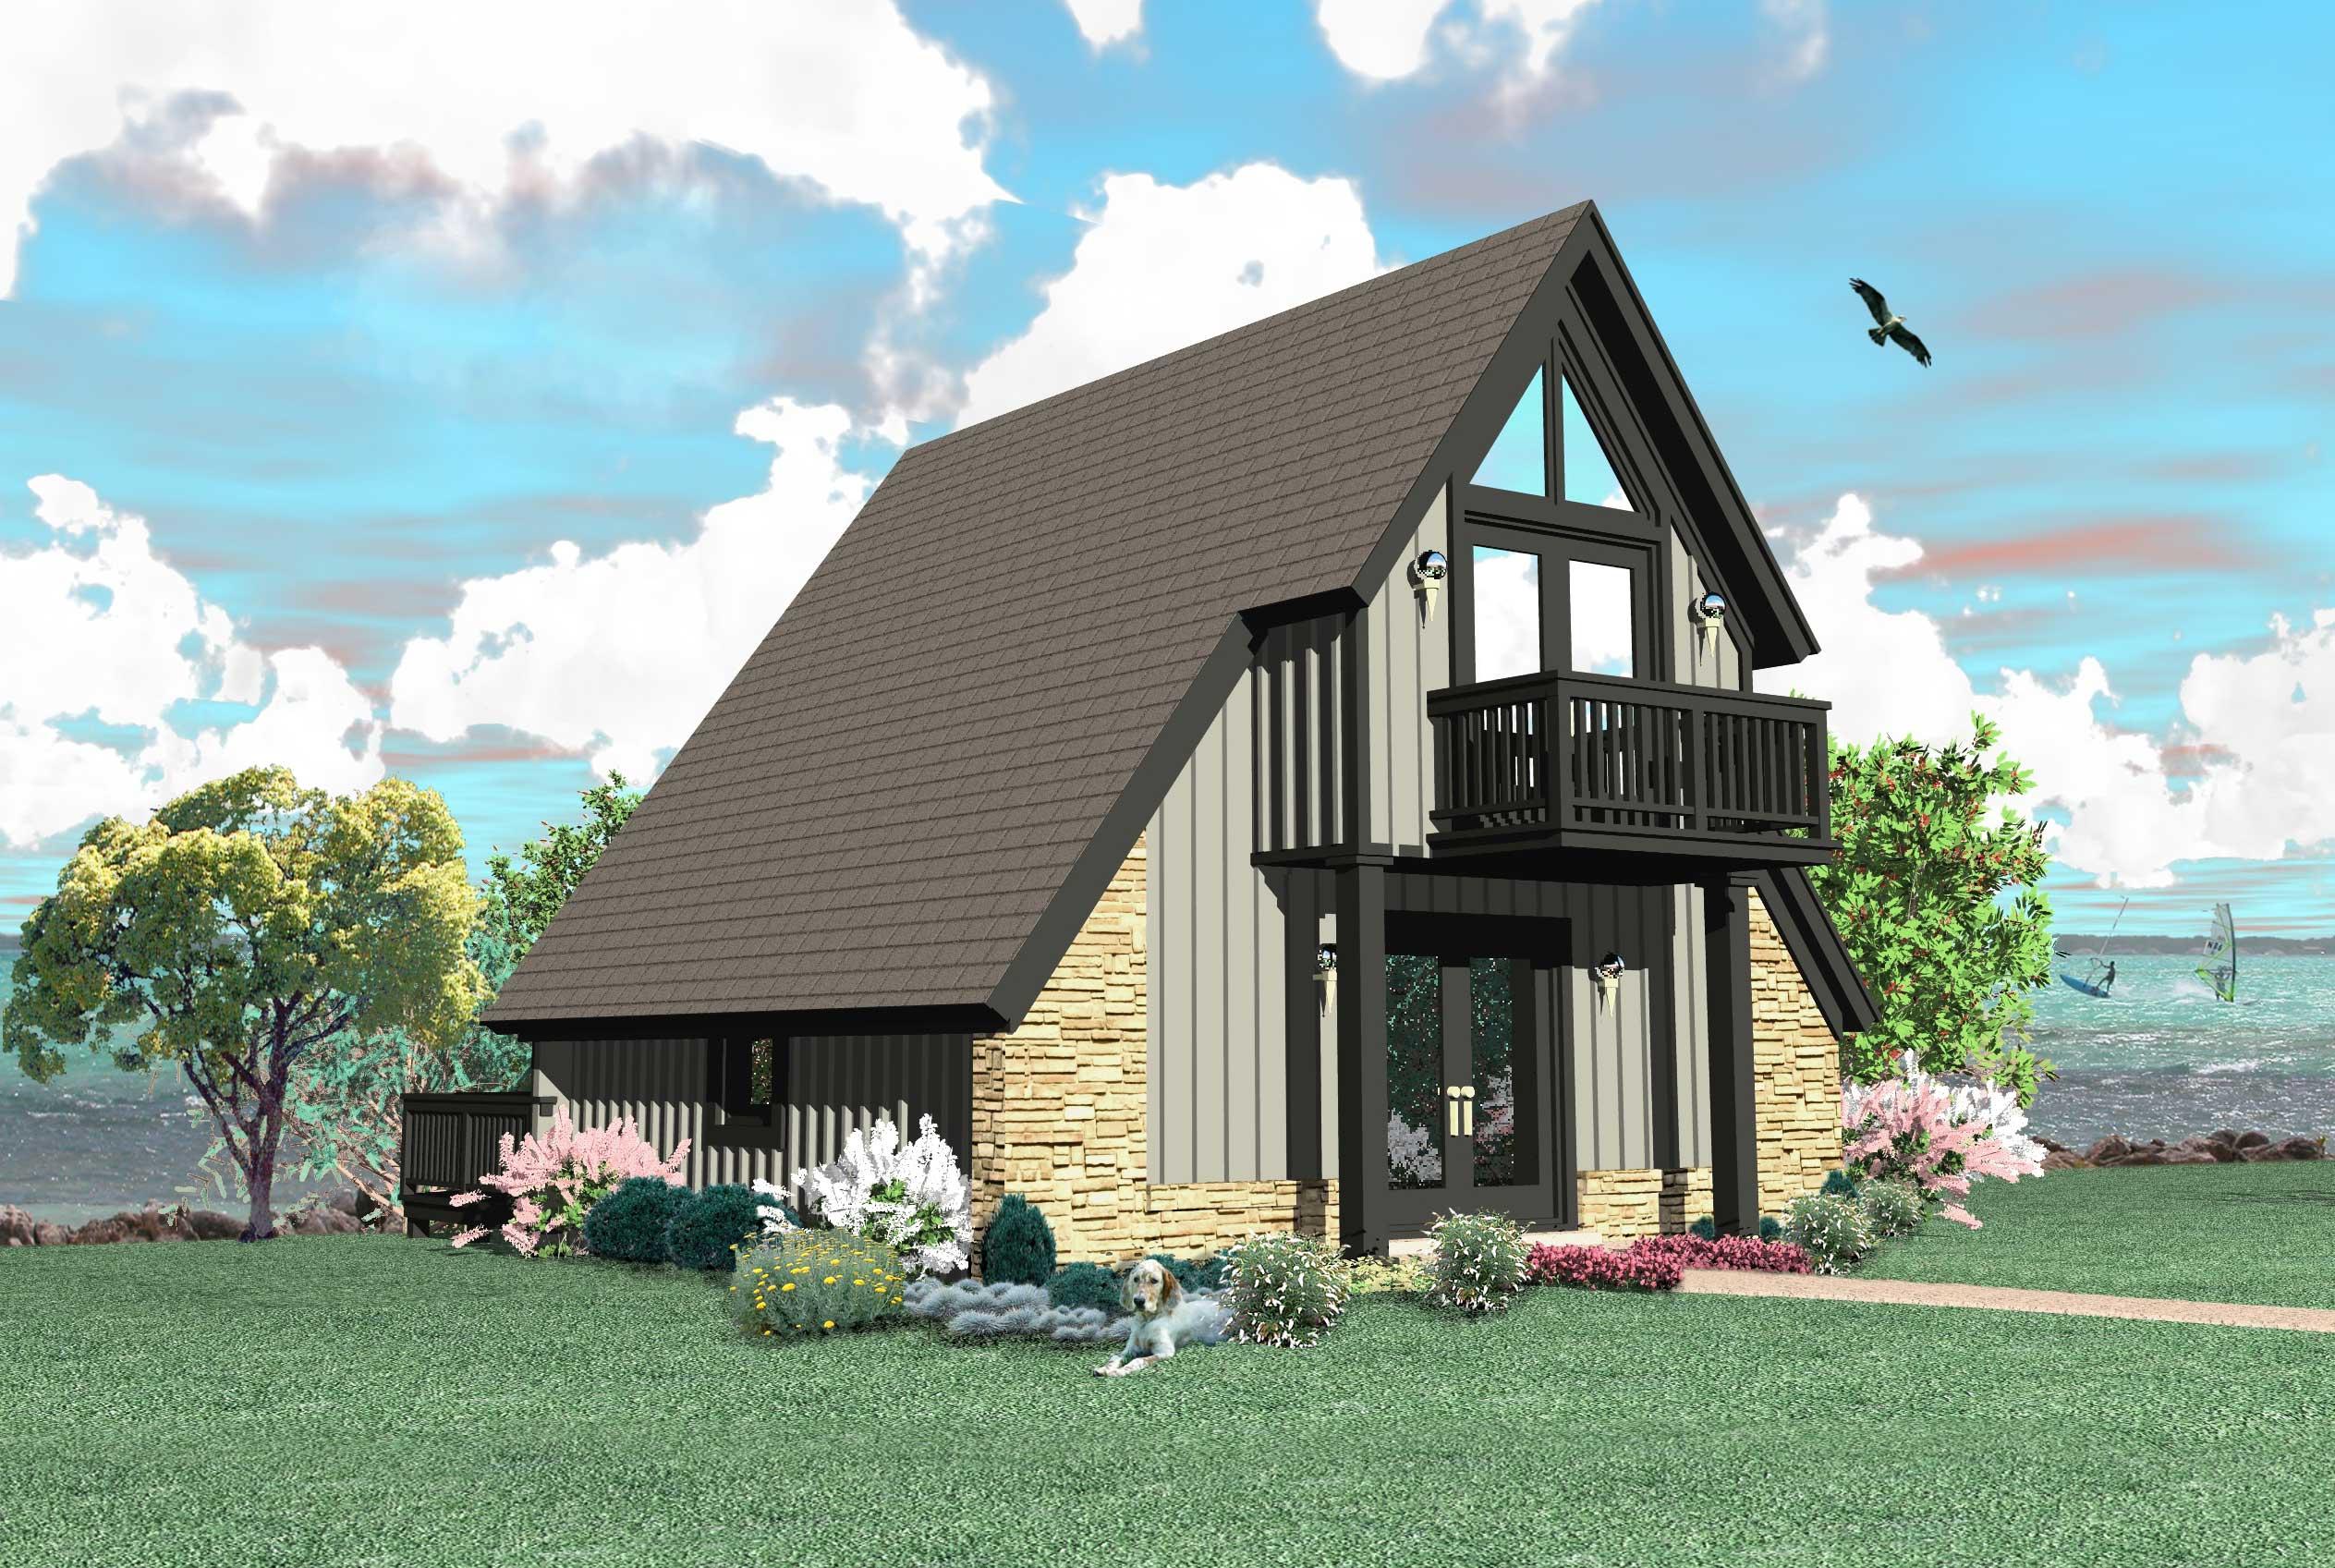 A Frame House Plans  Home Design SUB050050048T_RV NWD